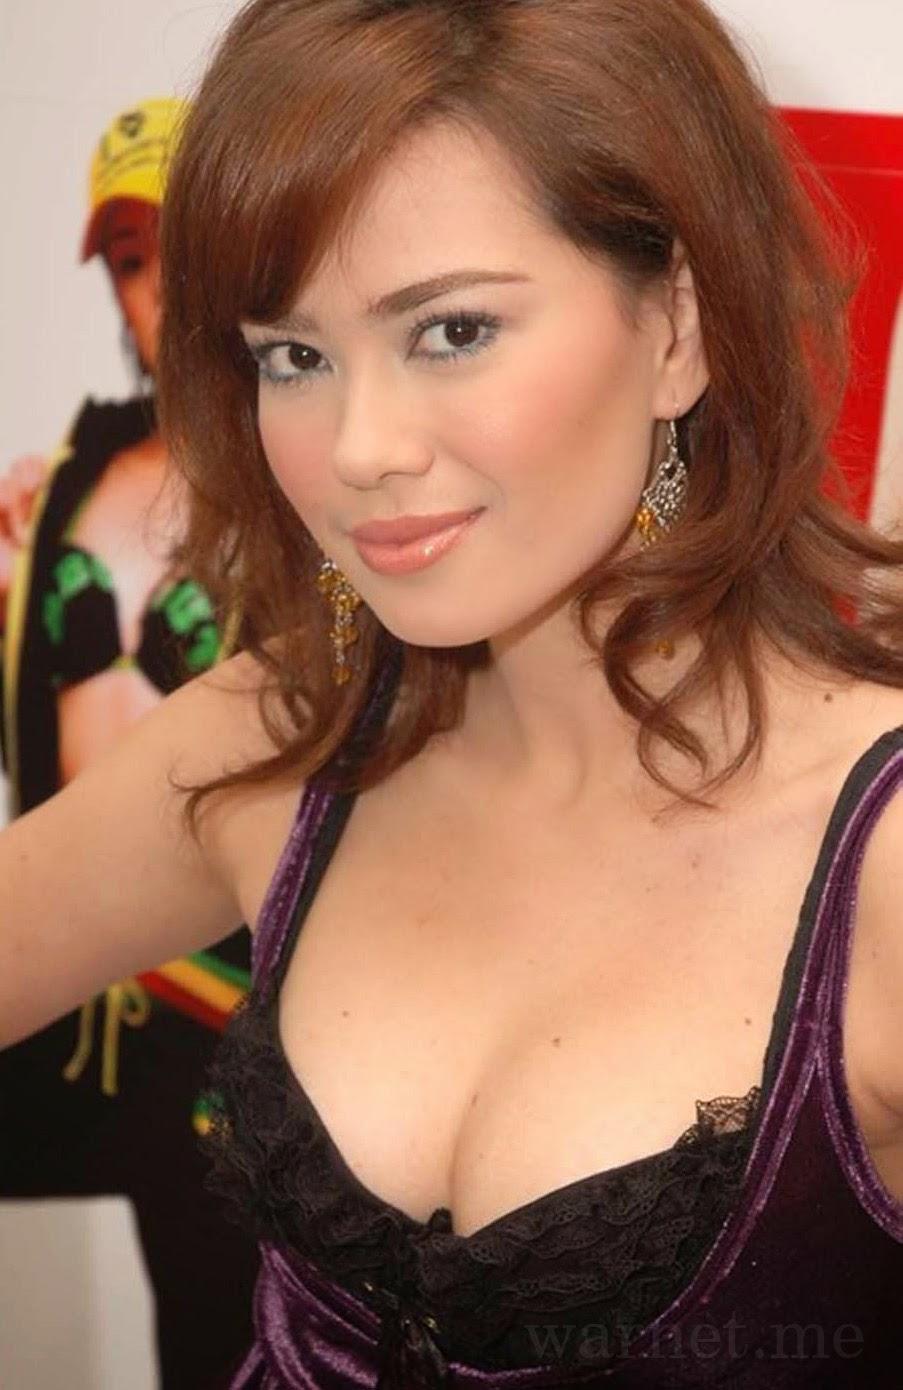 Images Keindahan Wanita Cantik Asli Indonesia Video Mesum Ustadz